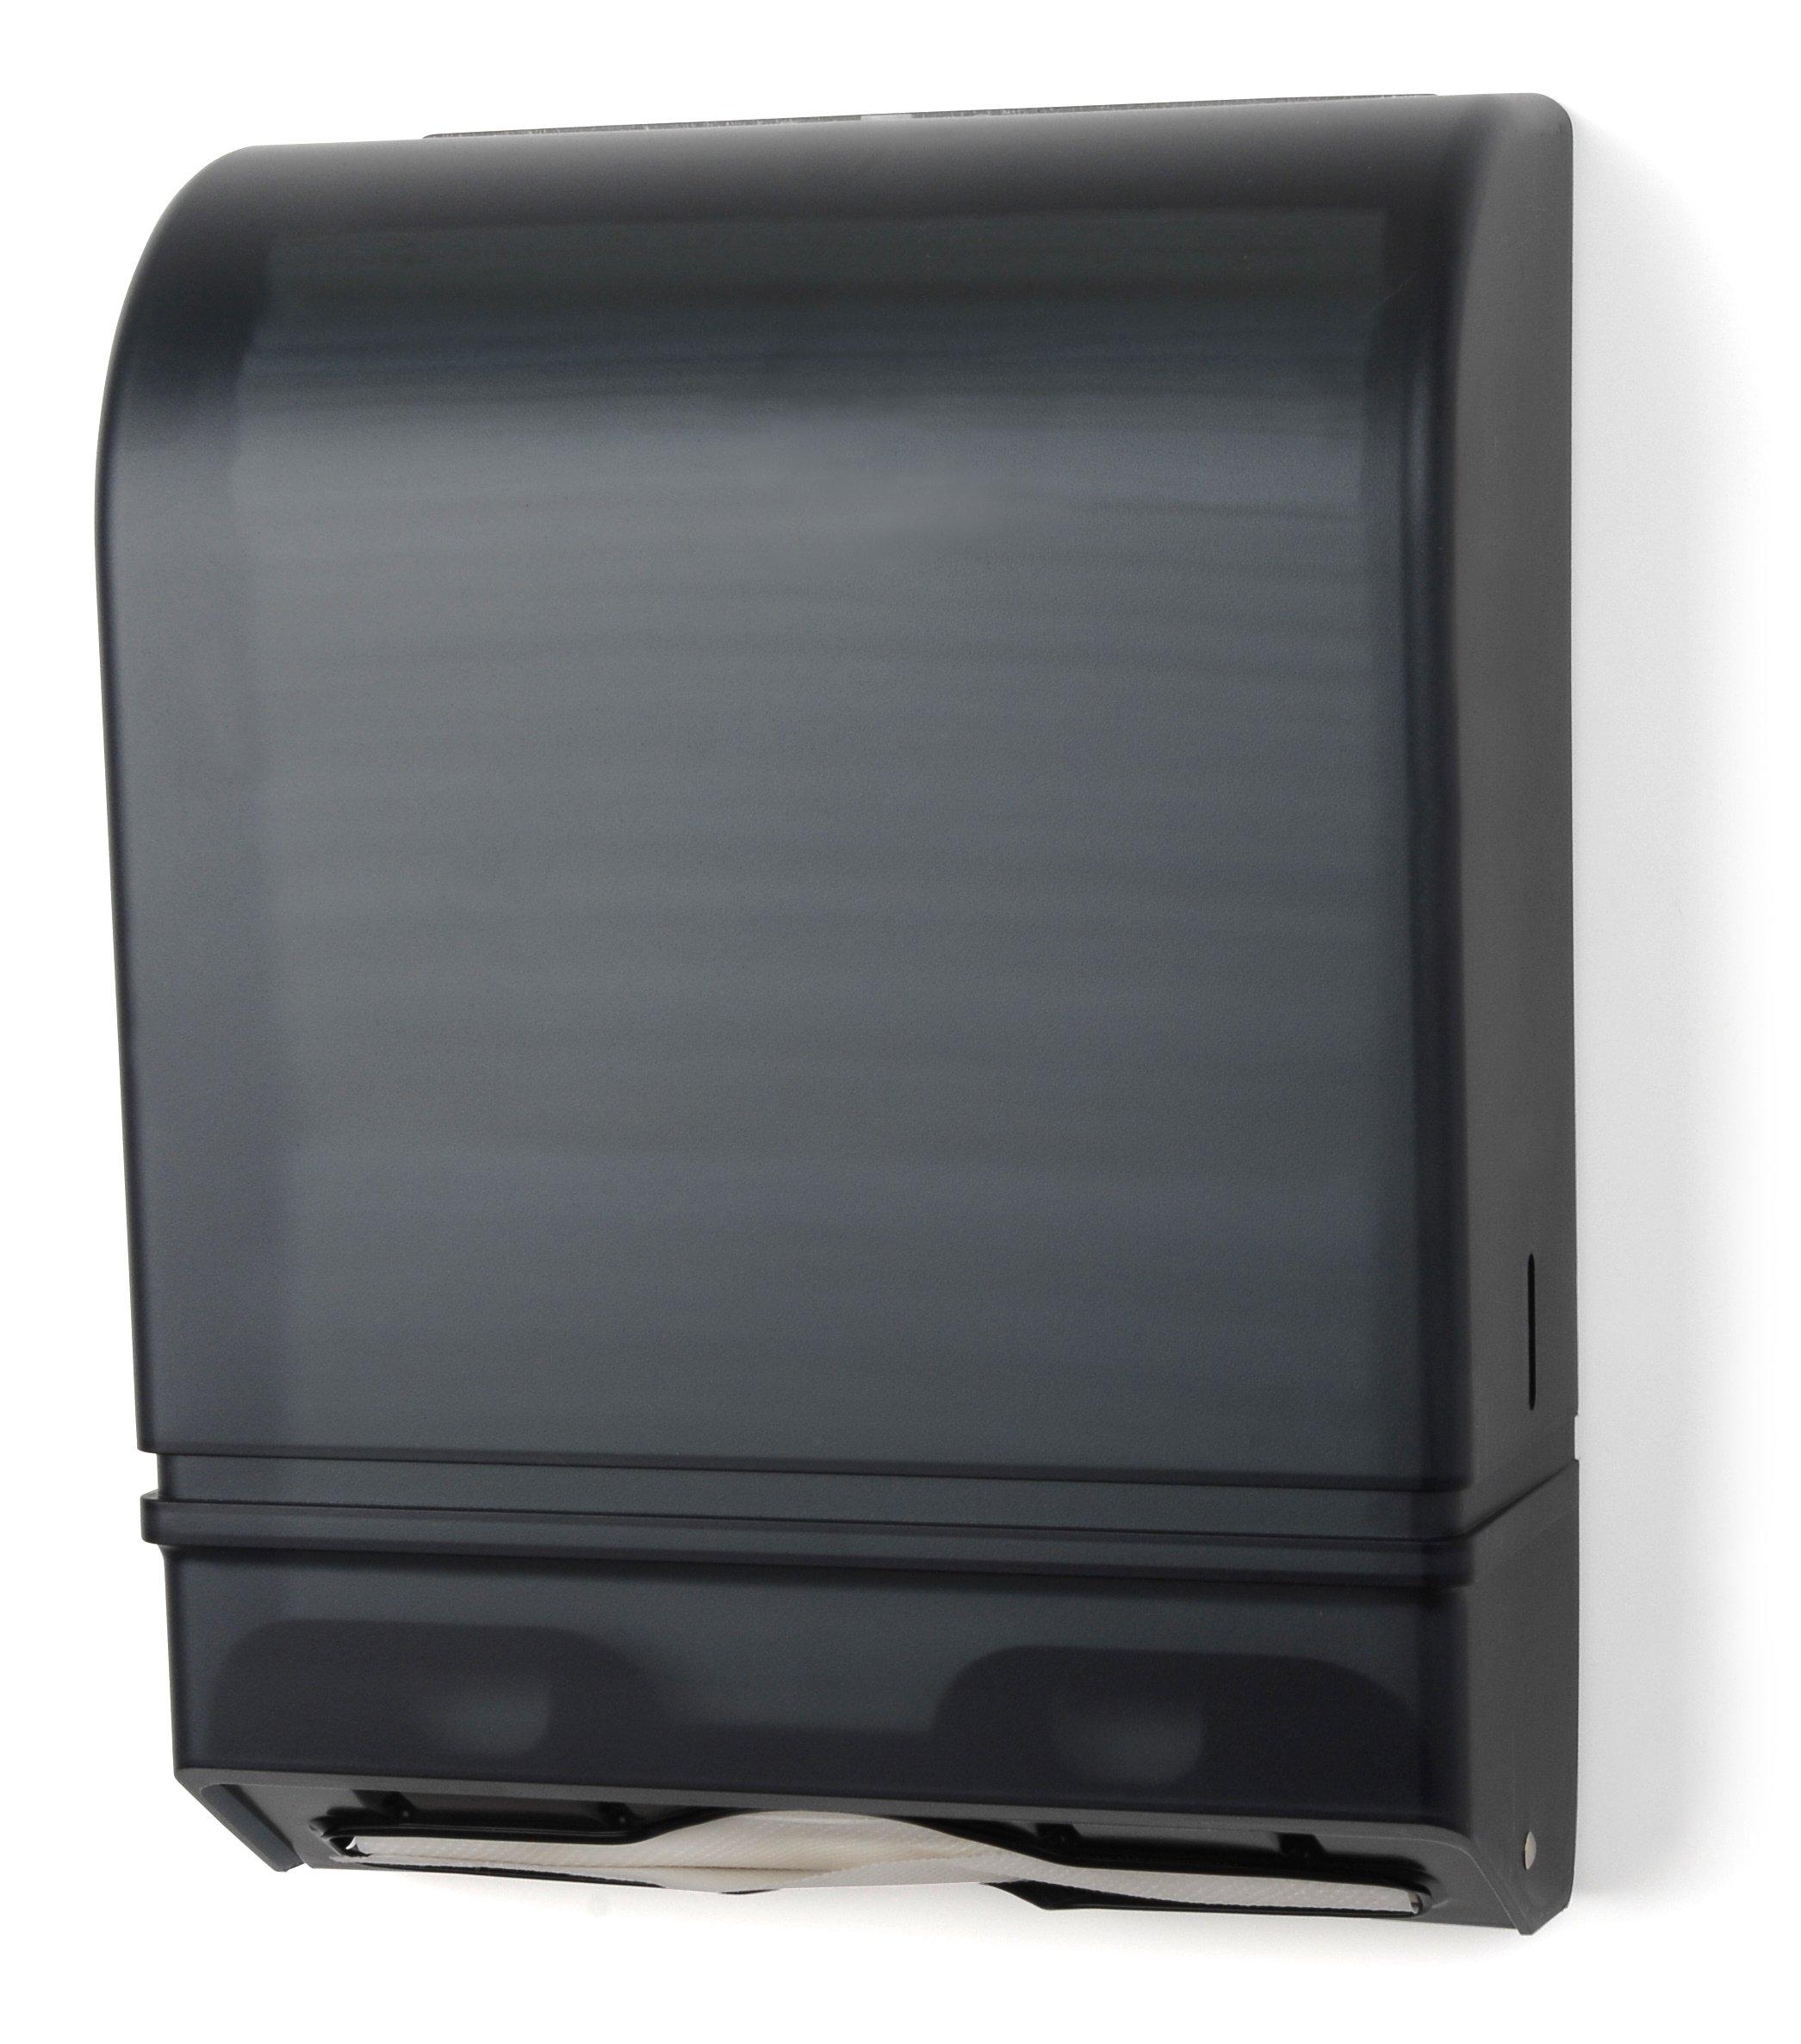 Palmer Fixture TD0175-01 Multi/C-Fold Towel Dispenser, Dark Translucent